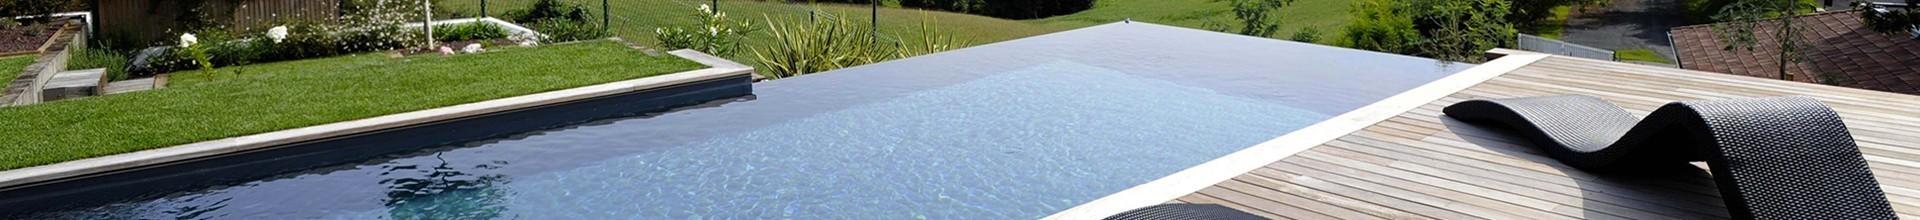 Direct usine, piscine coque prix Bourgogne Franche Comté